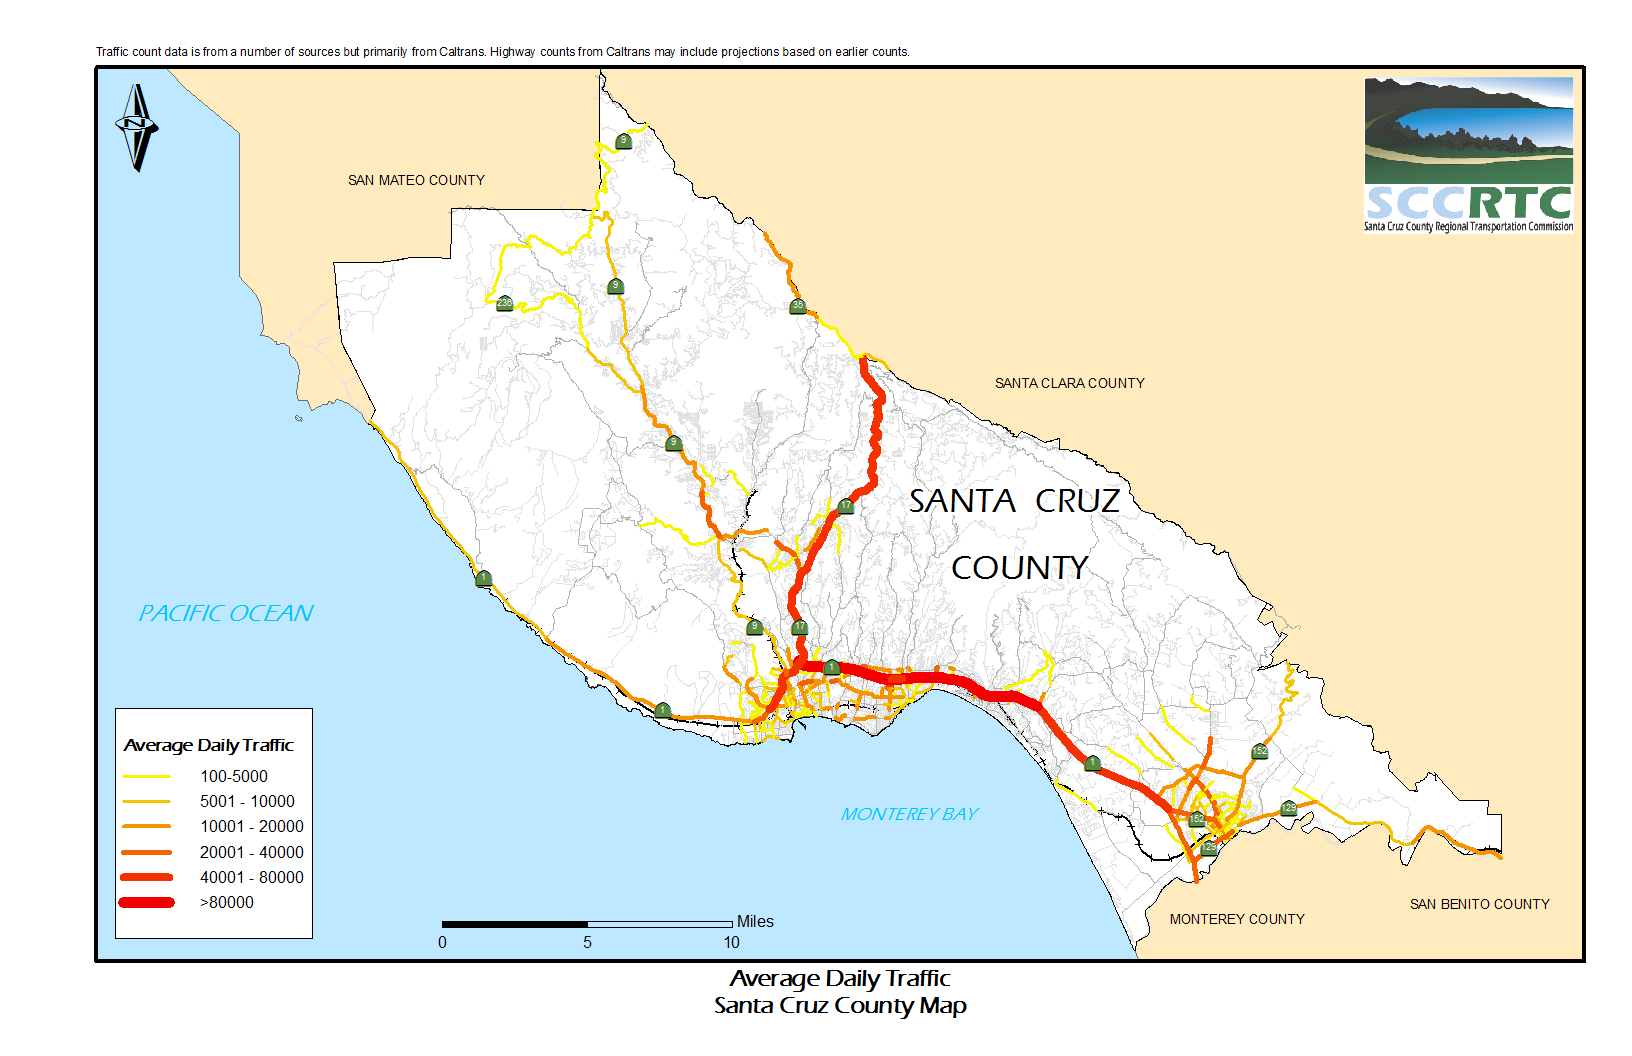 Data & Statistics Santa Cruz Map on san leandro on a map, san jose map, bumthang map, merizo map, port costa map, big sur map, san luis obispo map, half moon bay map, puente alto map, northern ca map, machico map, downieville map, san juan map, central ca map, barataria map, california map, san fransico state university on map, san francisco map, watsonville ca on map, rio blanco map,